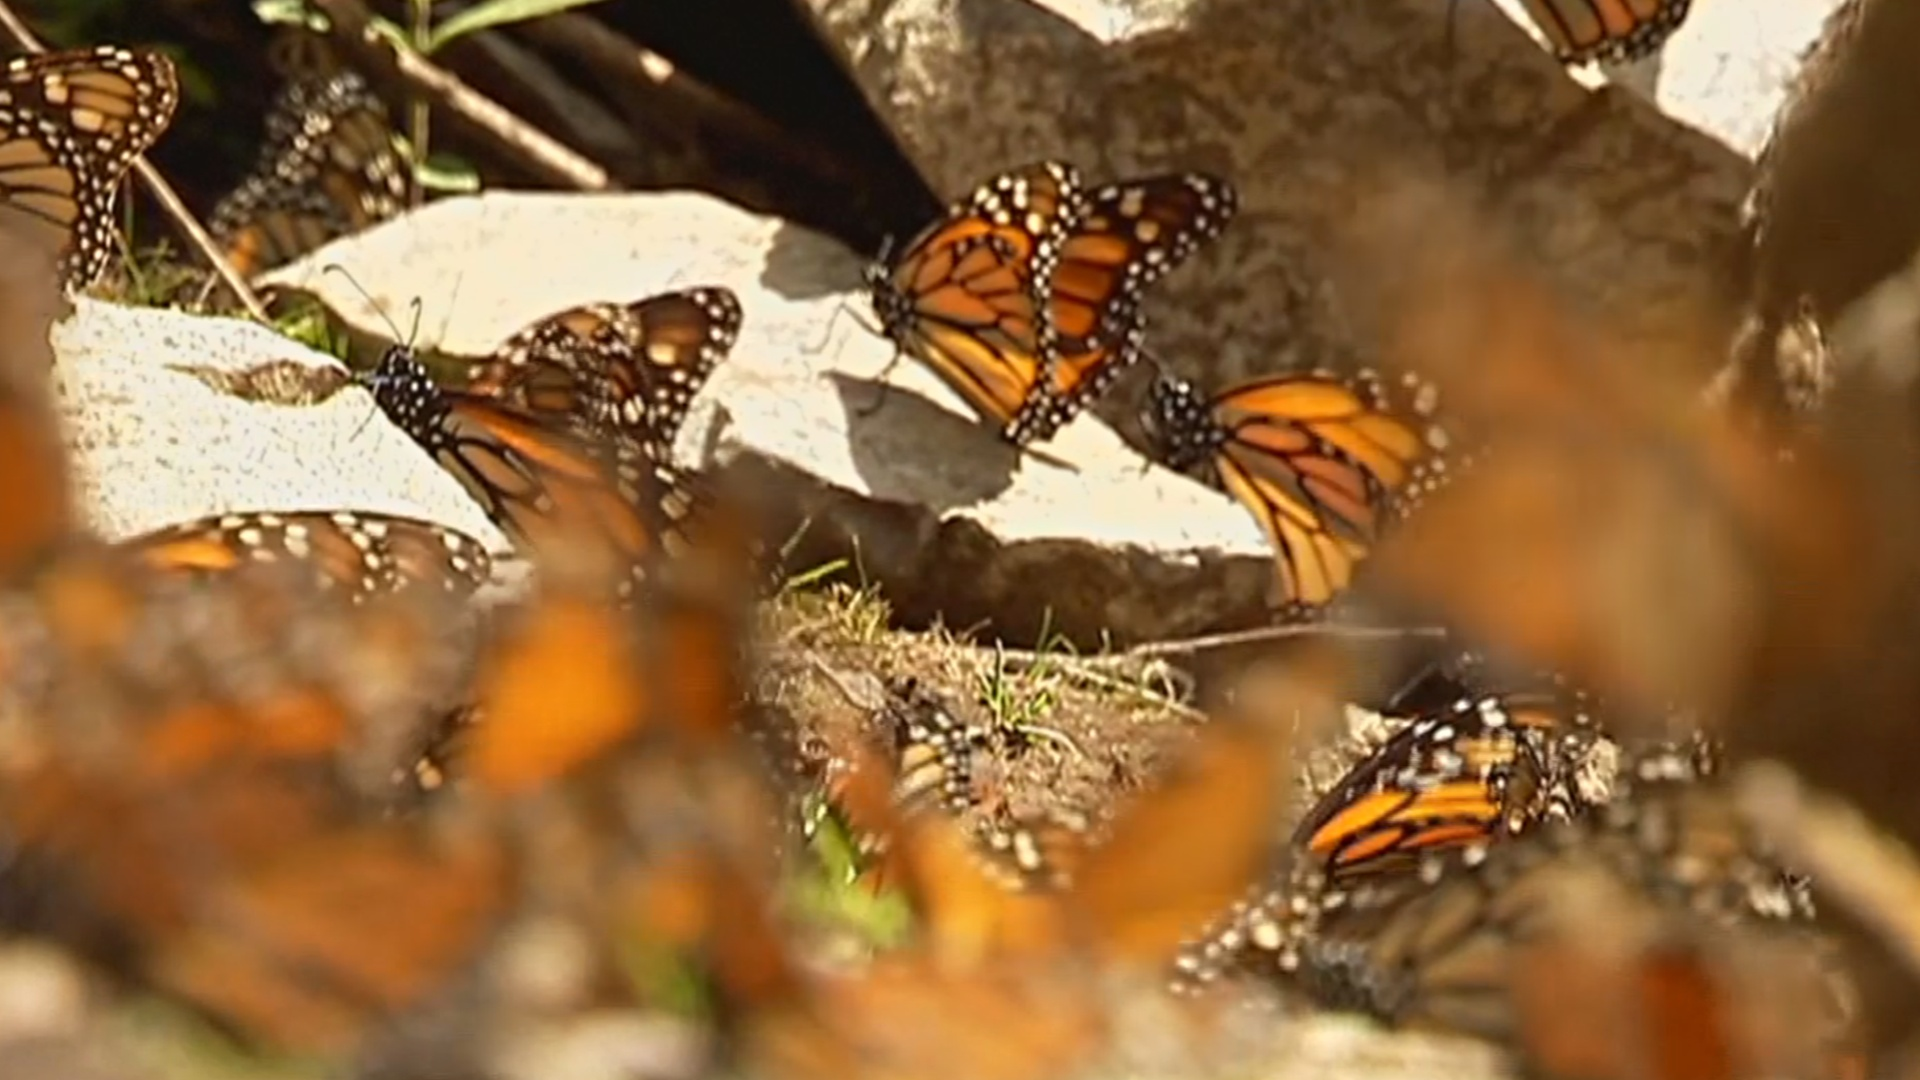 Популяция бабочек-монархов растёт